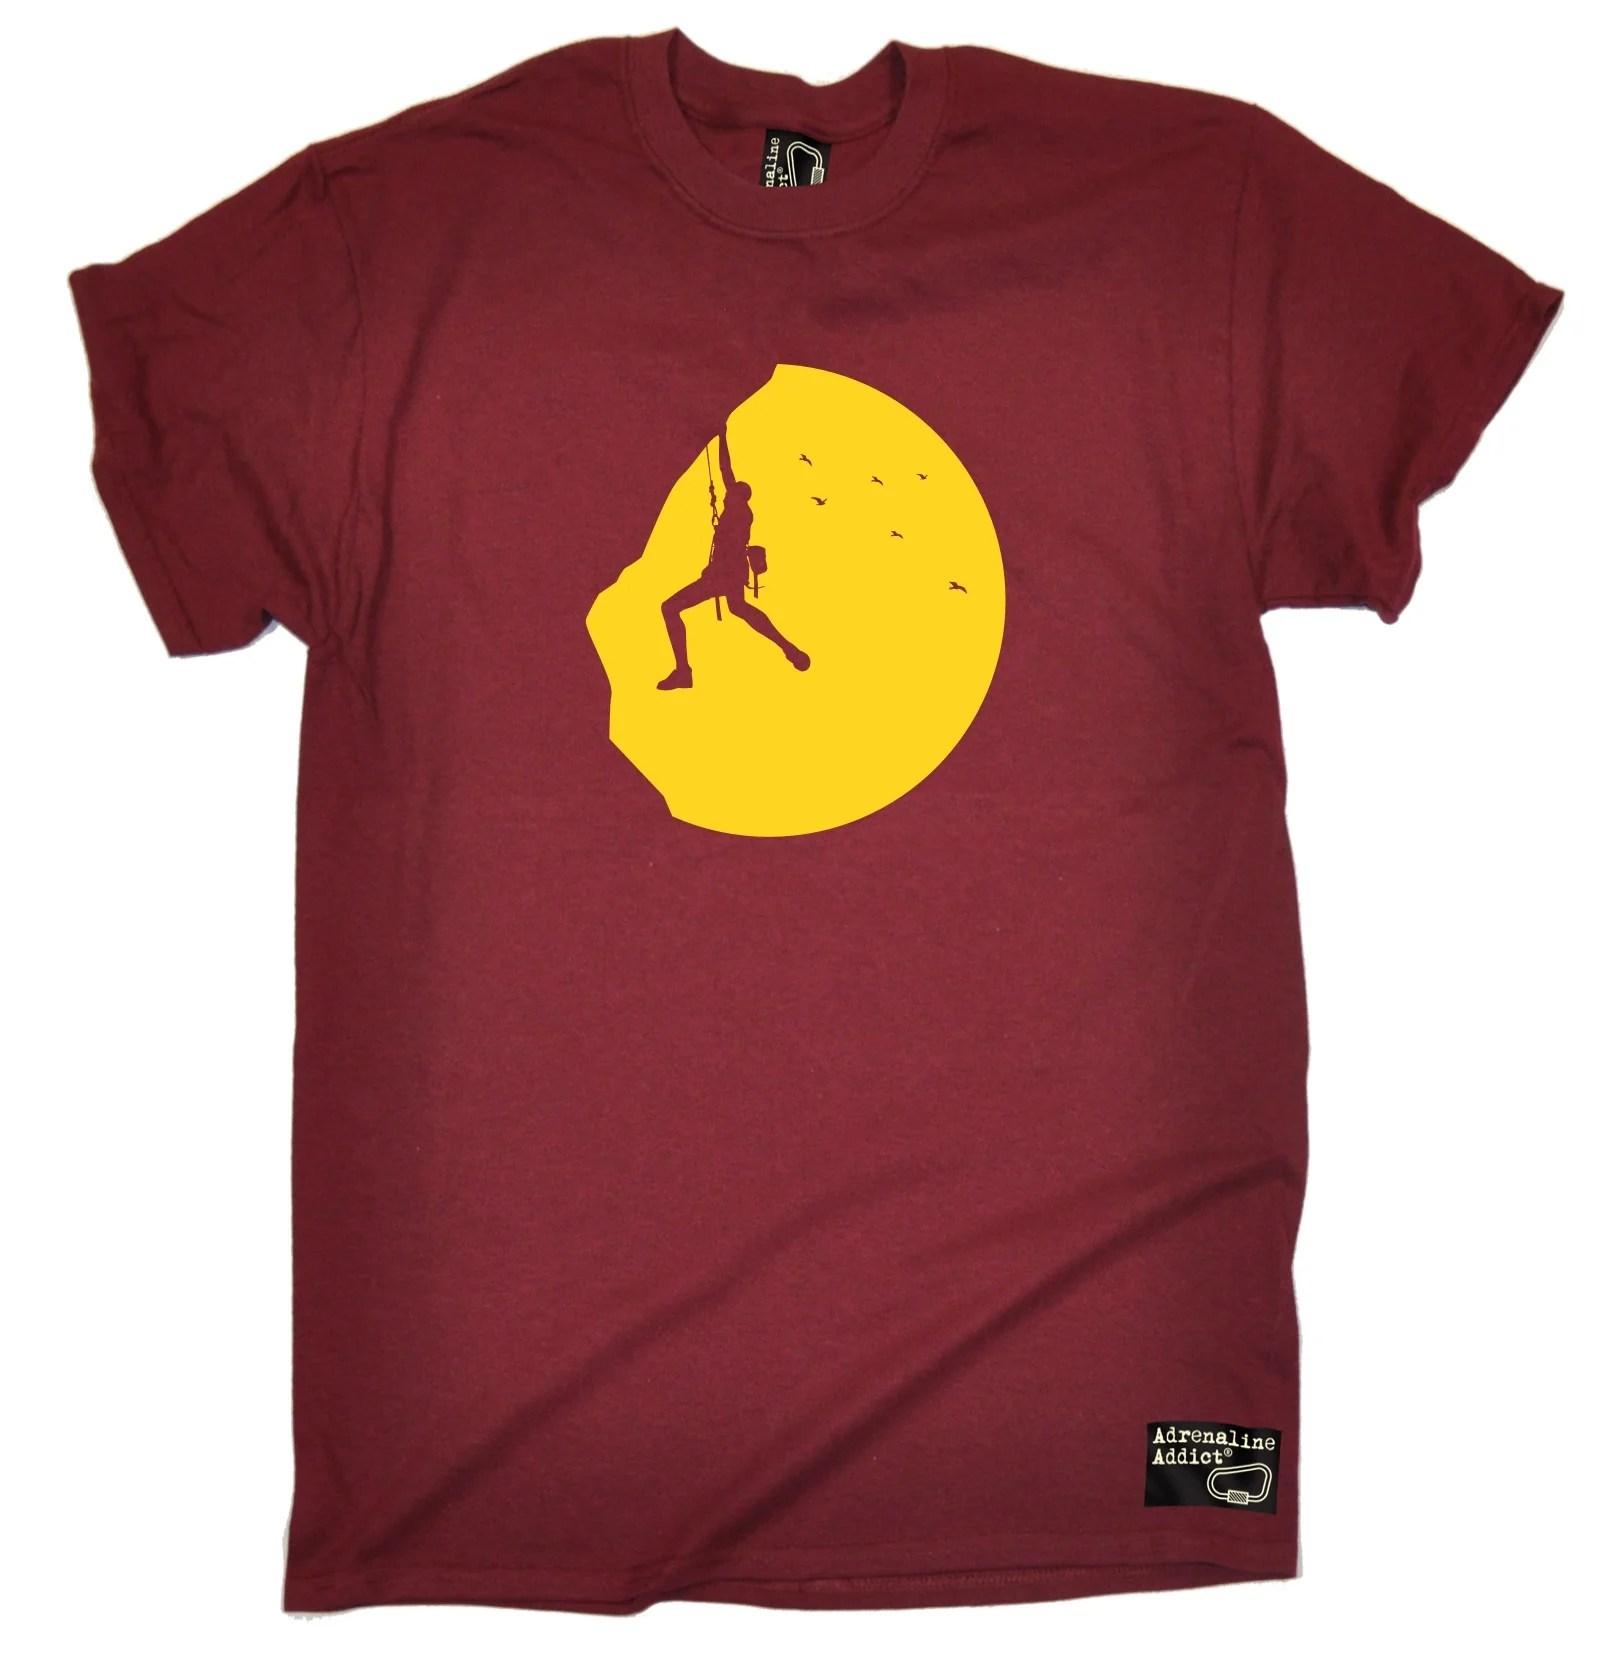 Rock Climbing Sunset T-shirt Tee Climb Gear Accessories Funny Birthday 123t